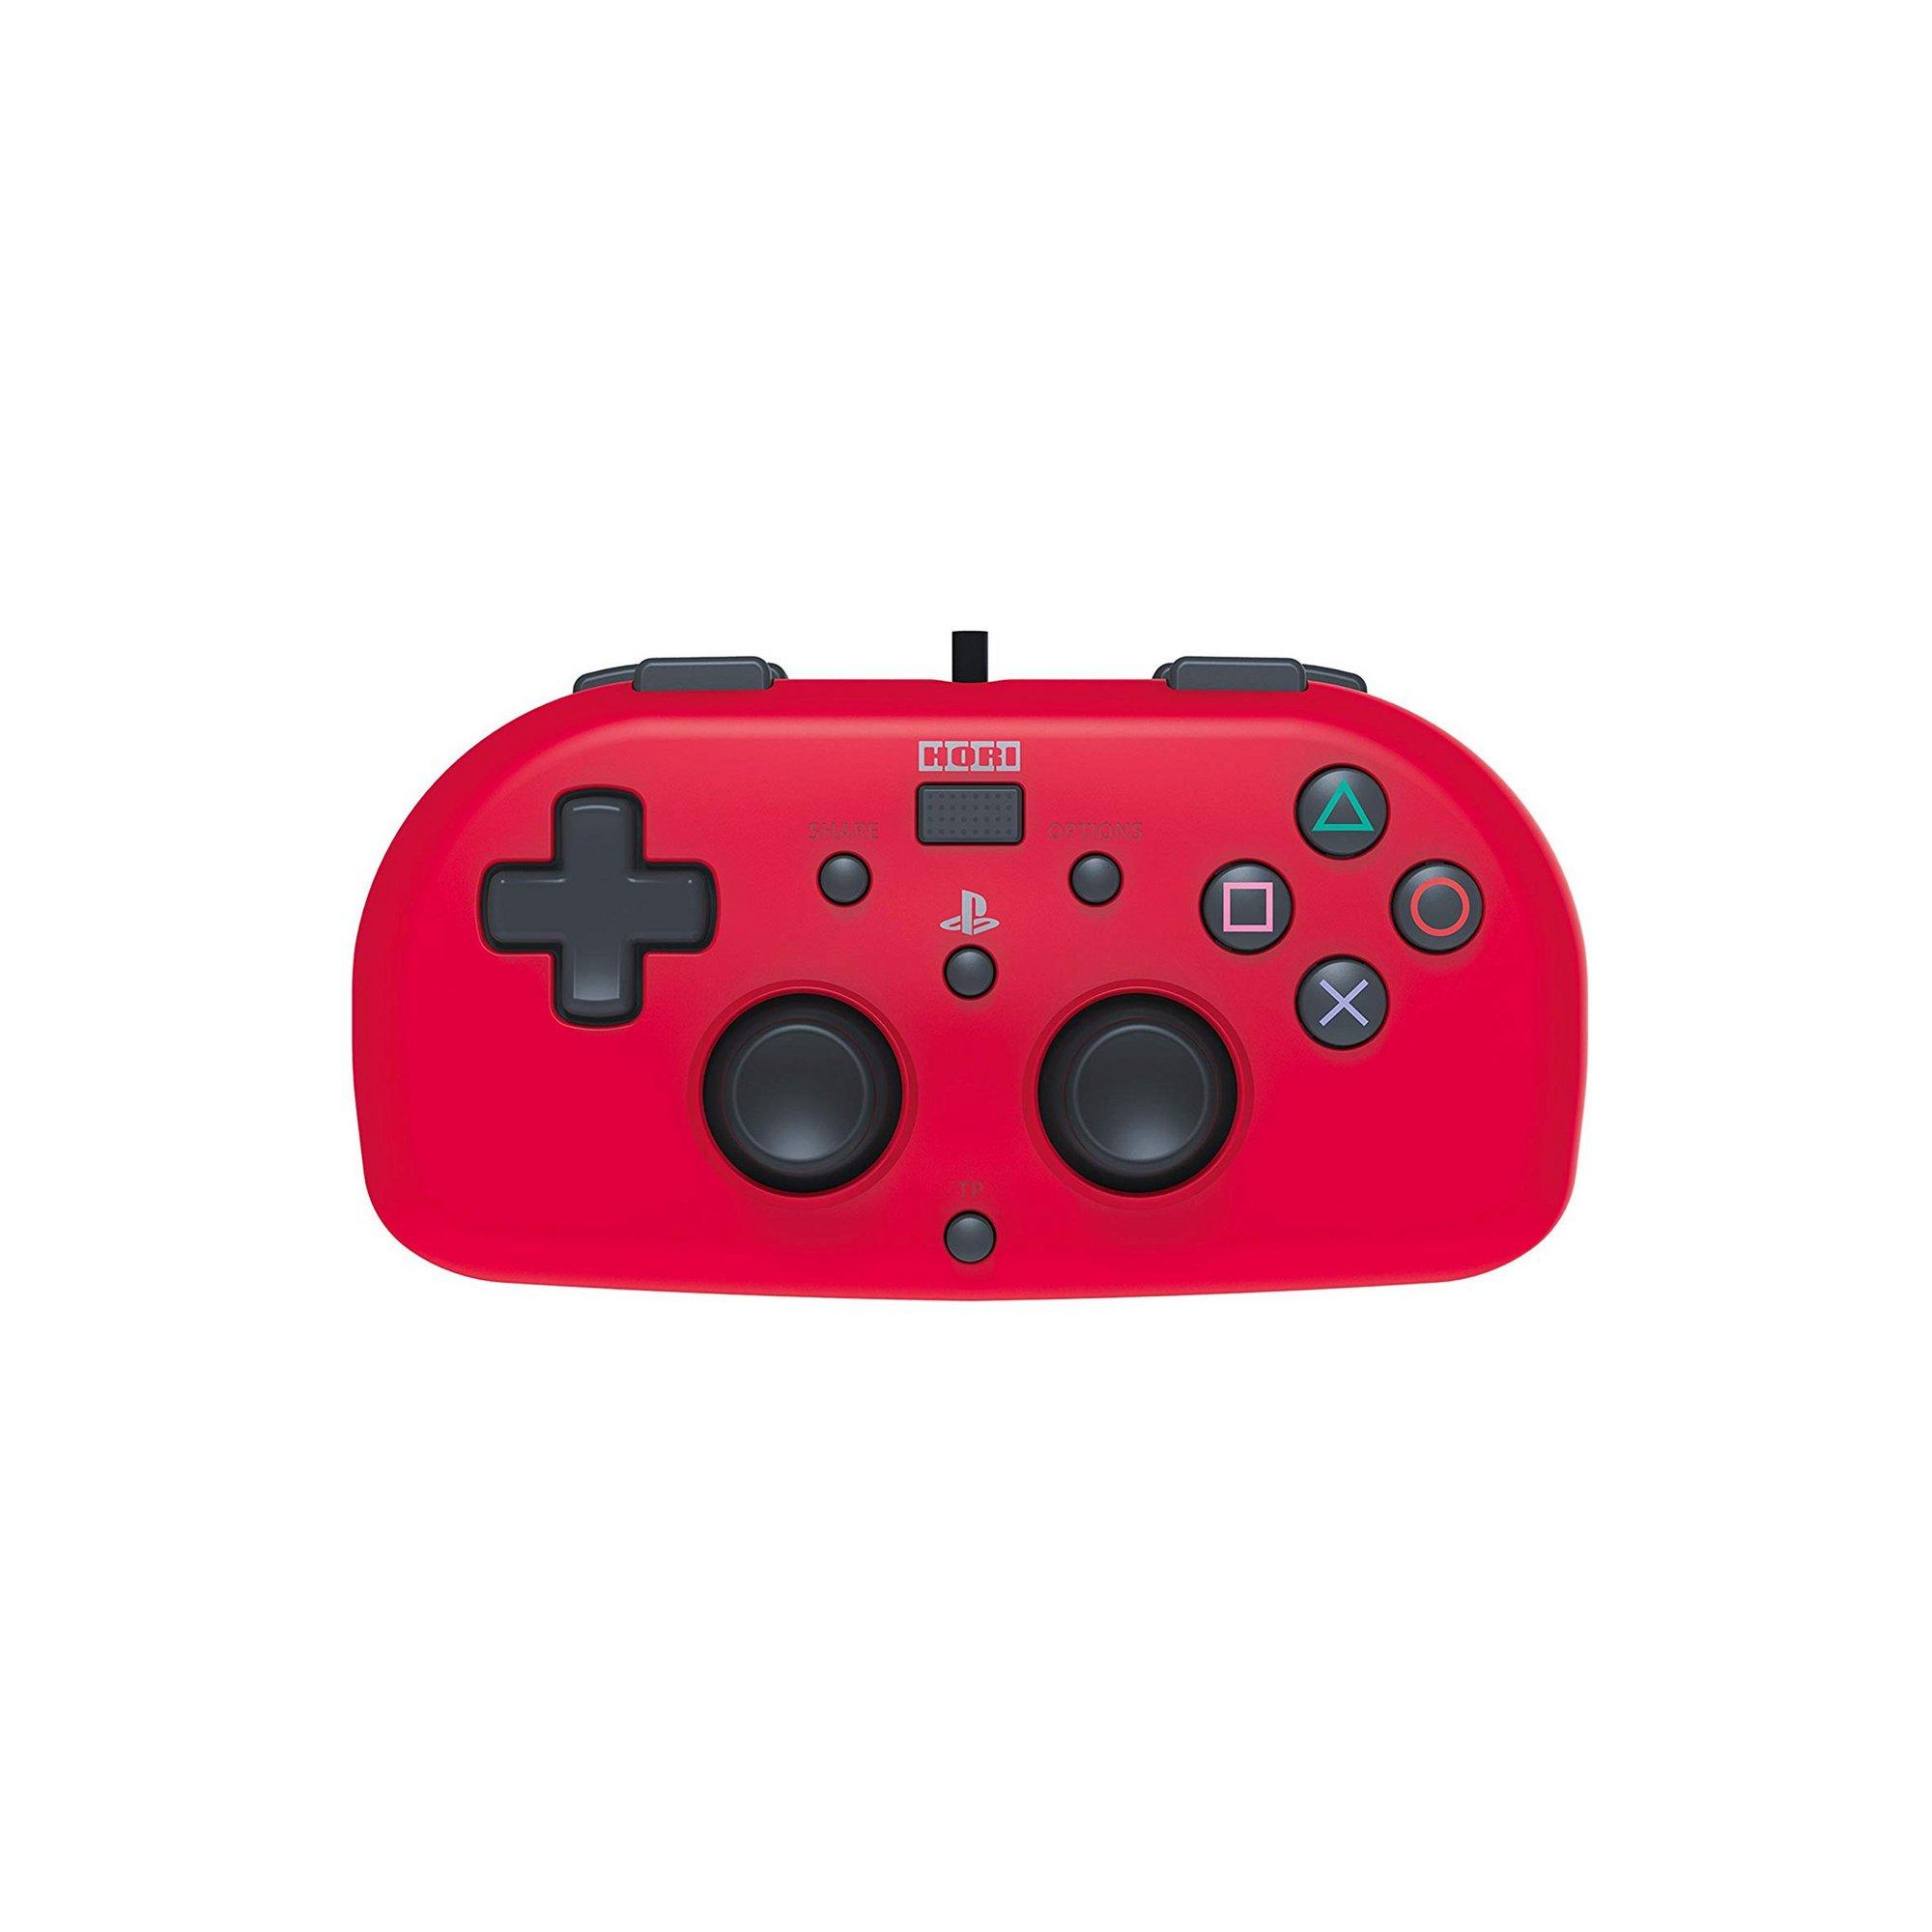 Image of Horipad Mini PS4 Controller